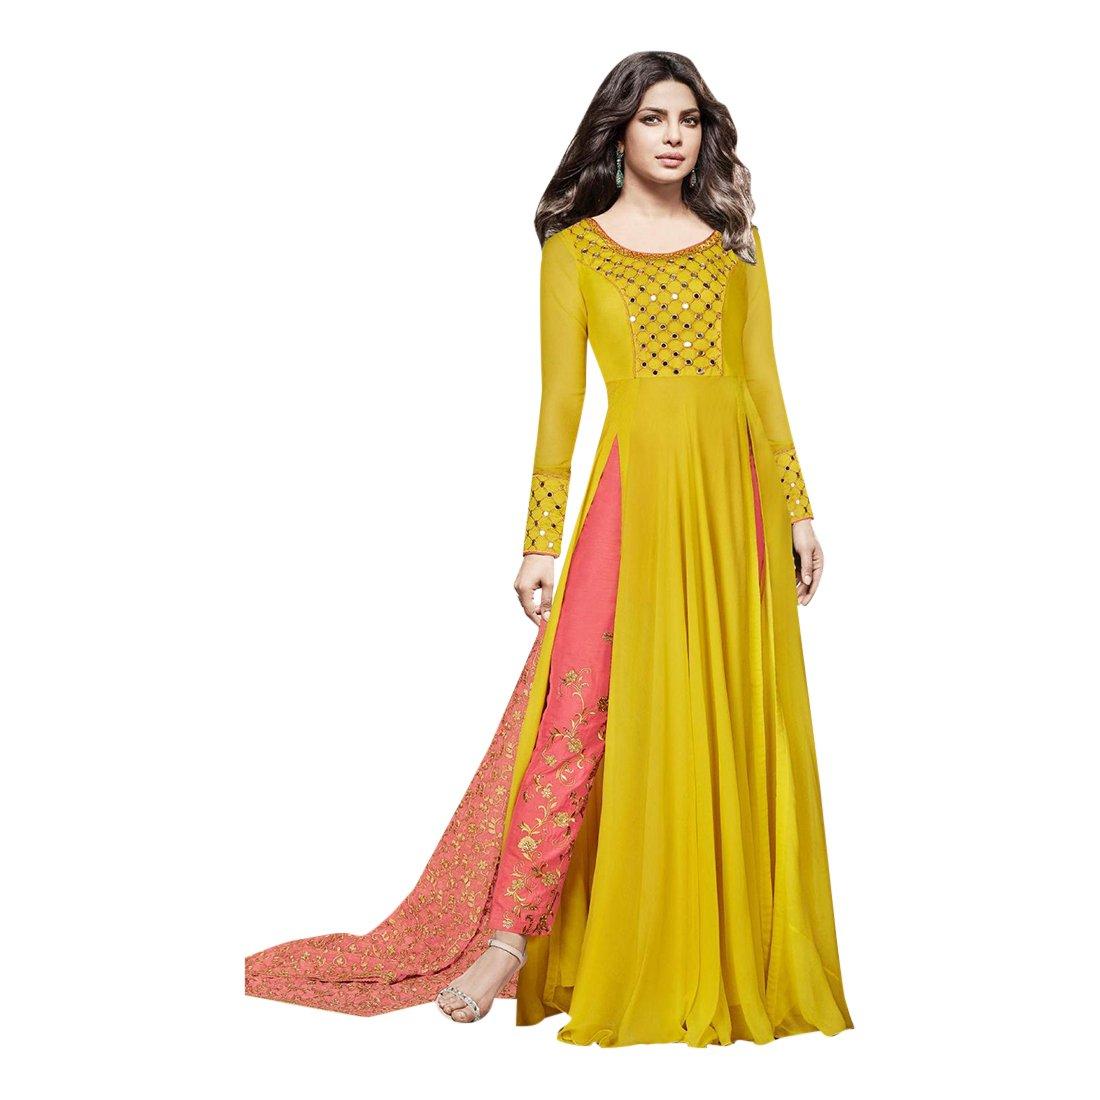 Designer Wedding Ceremony Floor Length Anarkali Suit With